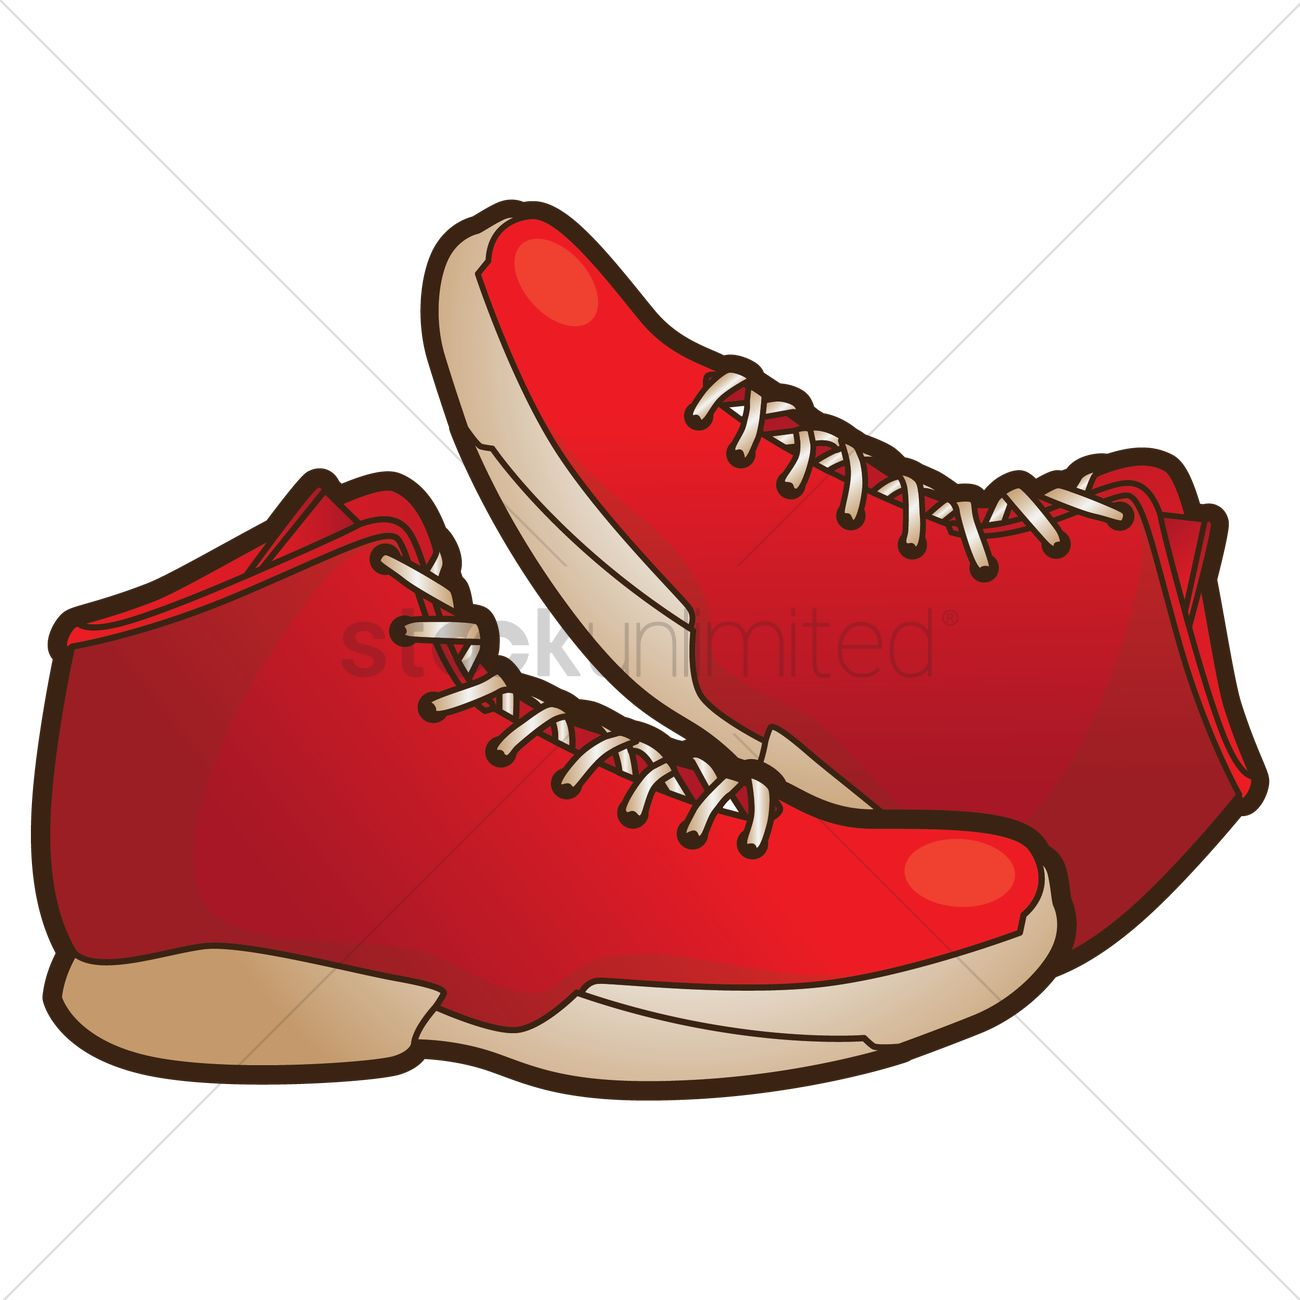 Free Basketball shoes Vector Image